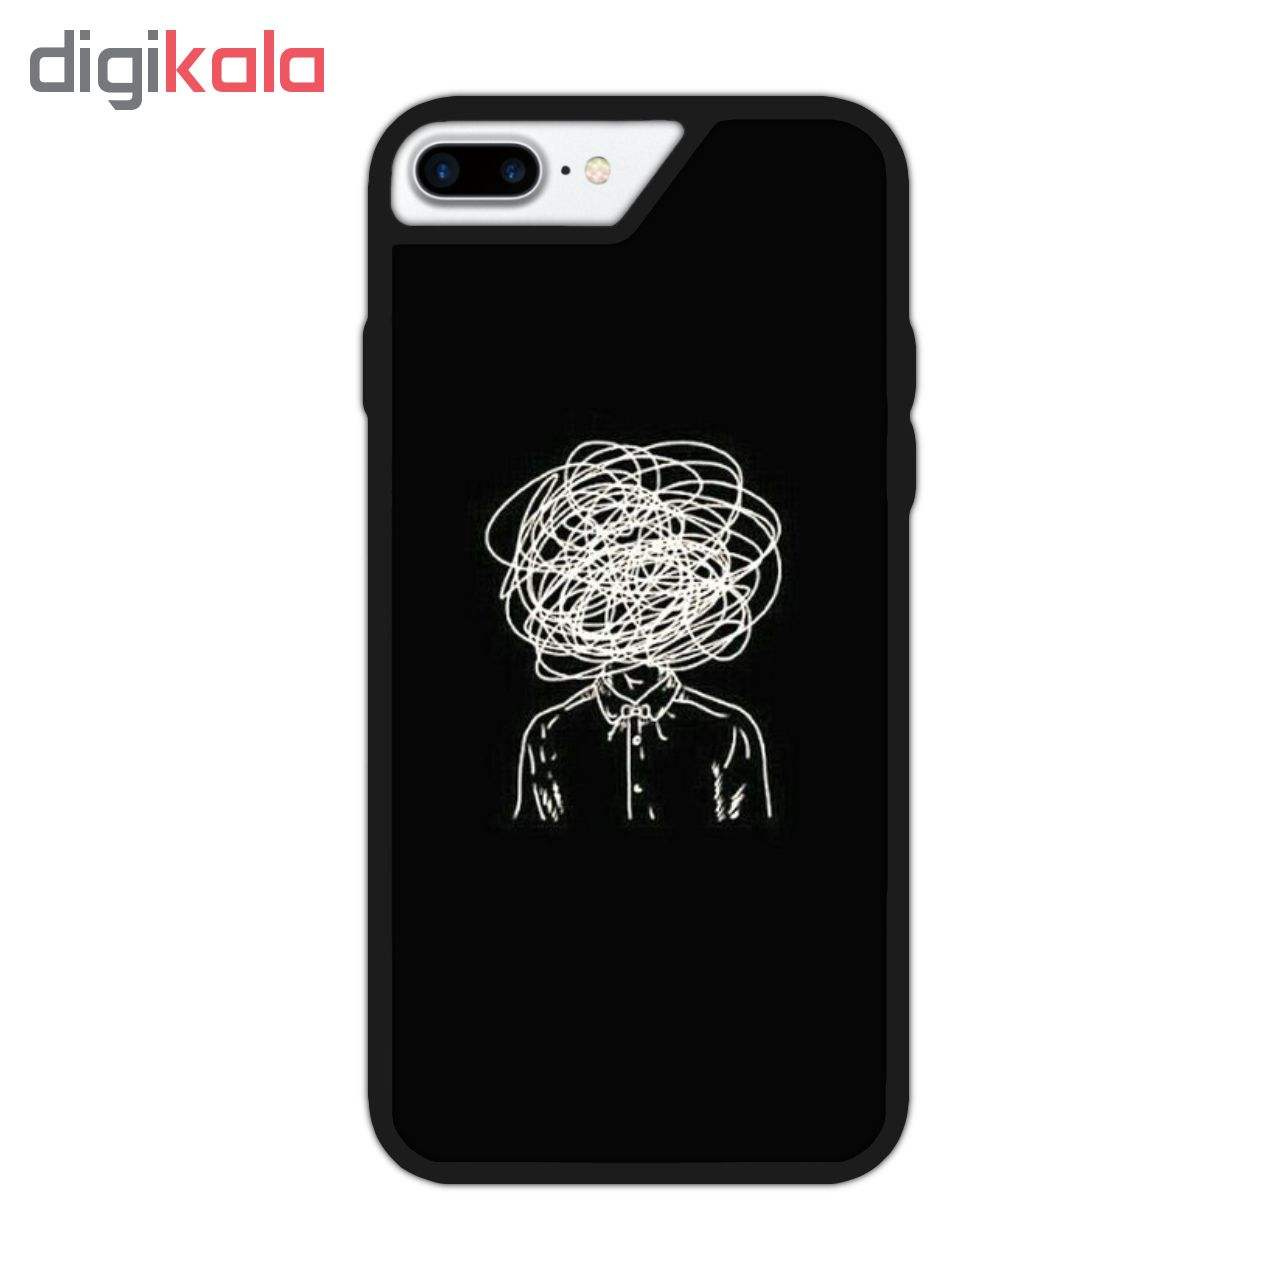 کاور آکام مدل A7P0888 مناسب برای گوشی موبایل اپل iPhone 7 Plus/8 plus main 1 1